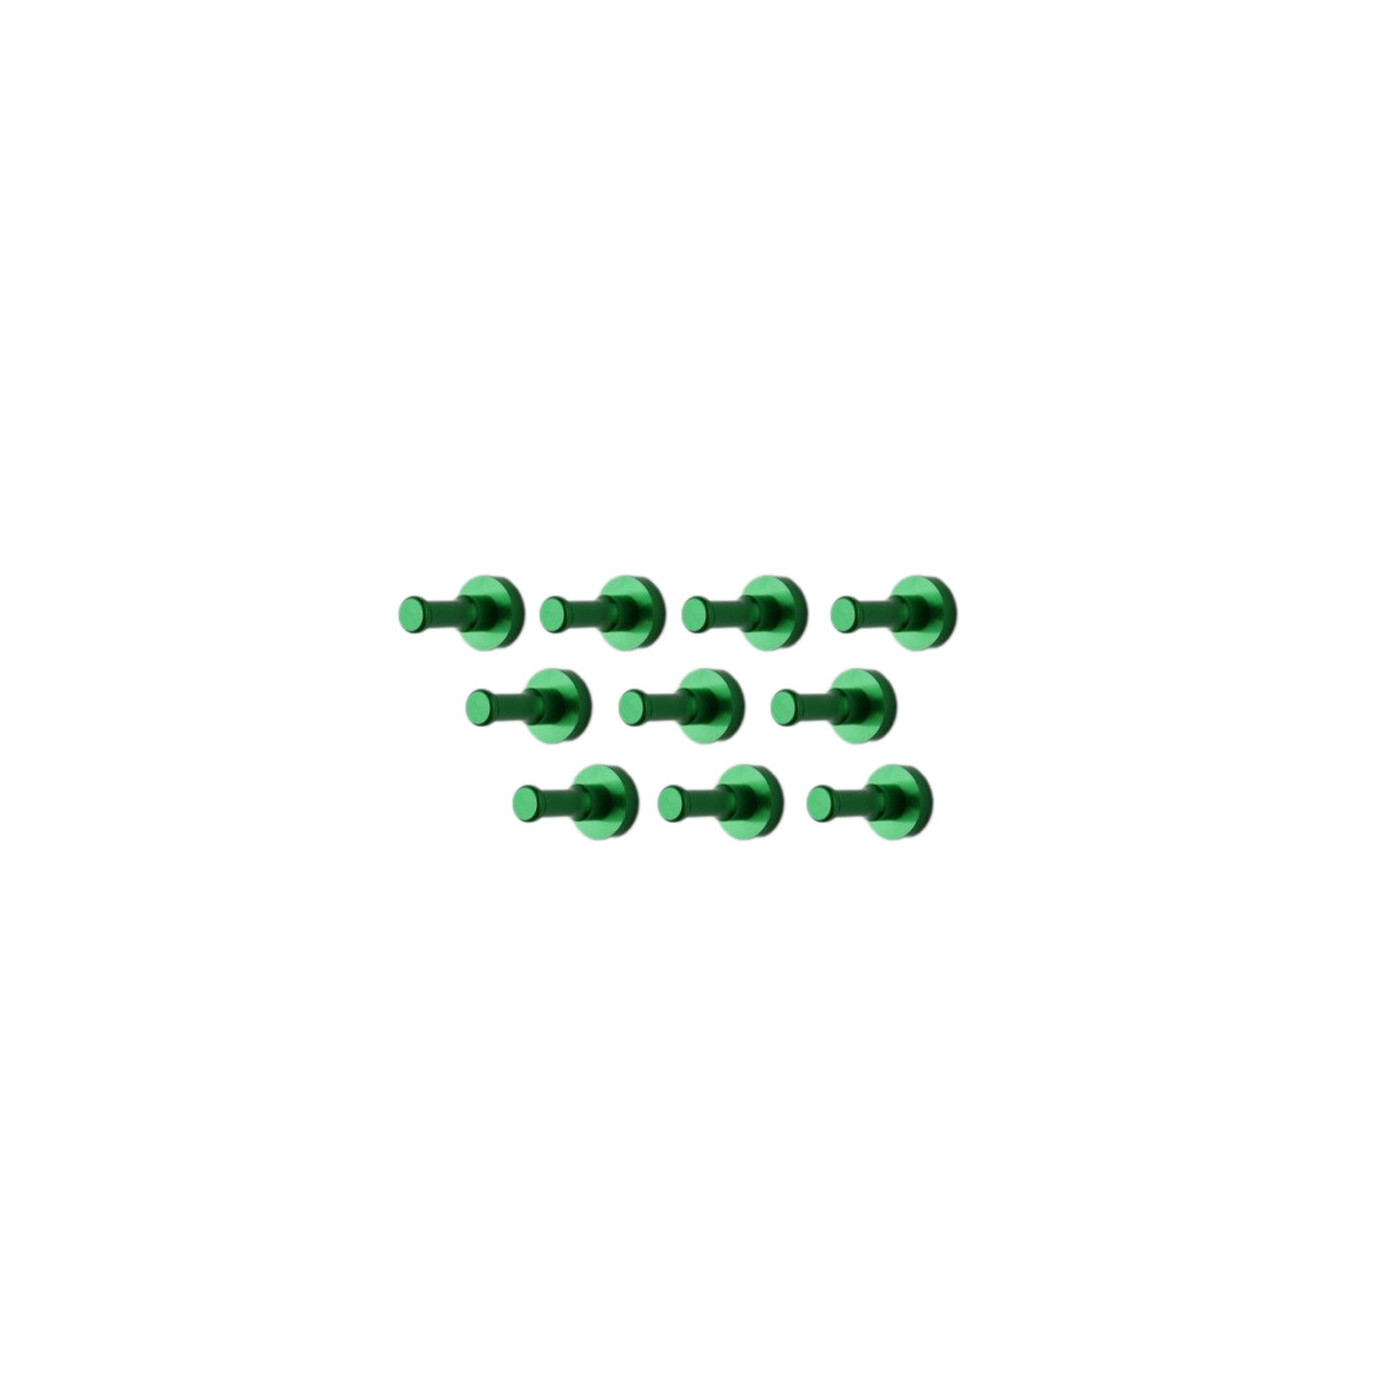 Set di 10 ganci appendiabiti in metallo, staffe da parete, verde